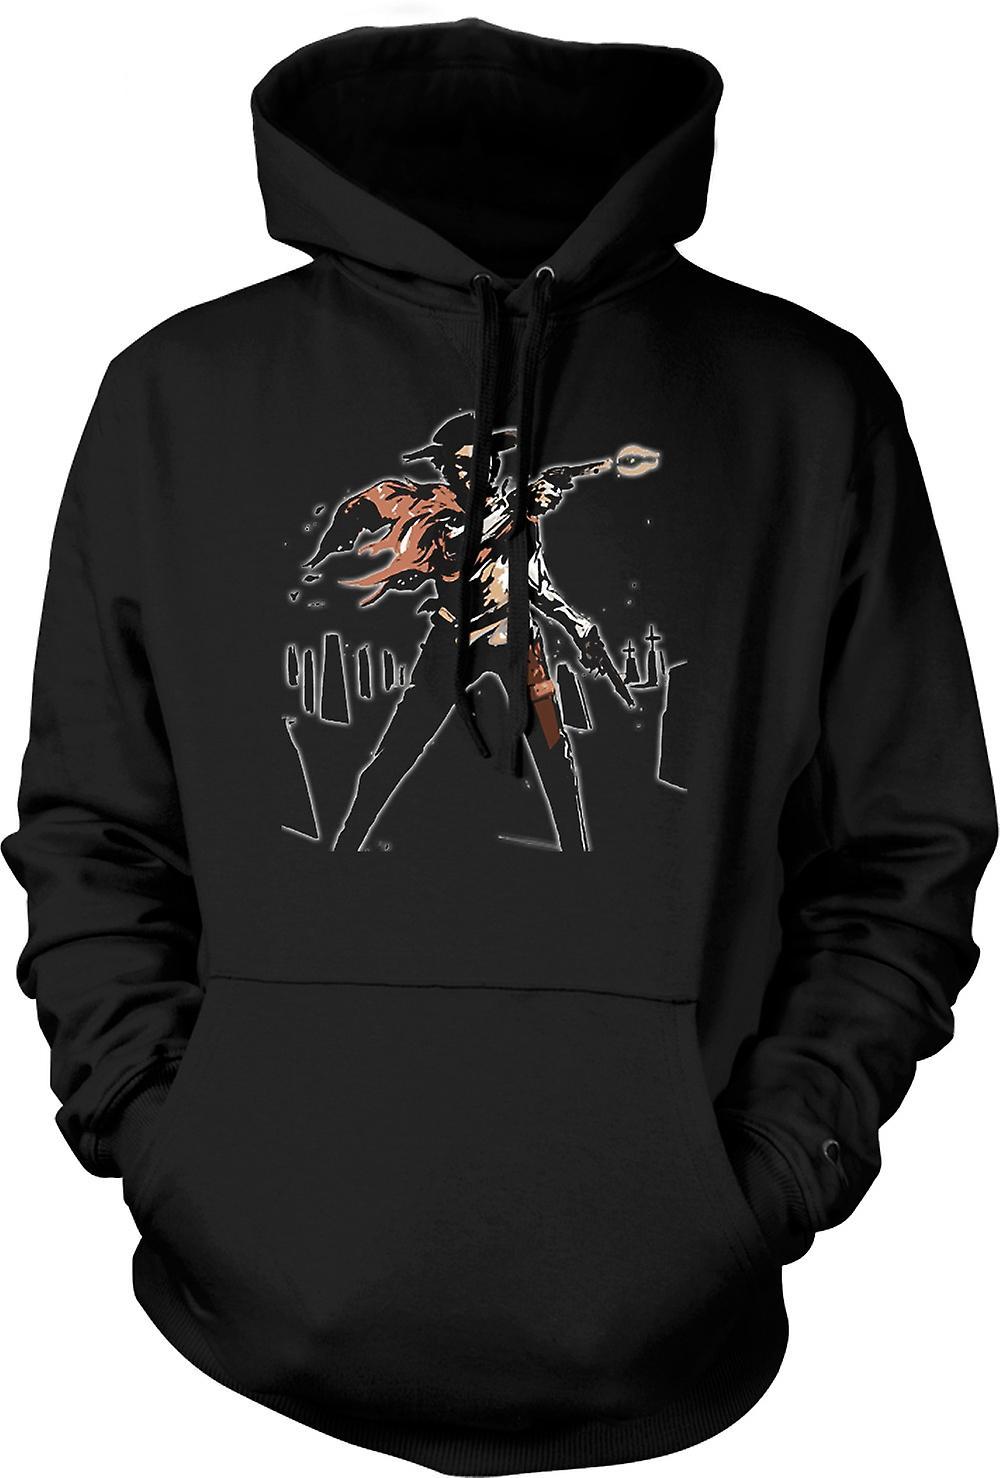 Barna hettegenser - Spaghetti Western - Cowboy - skisse